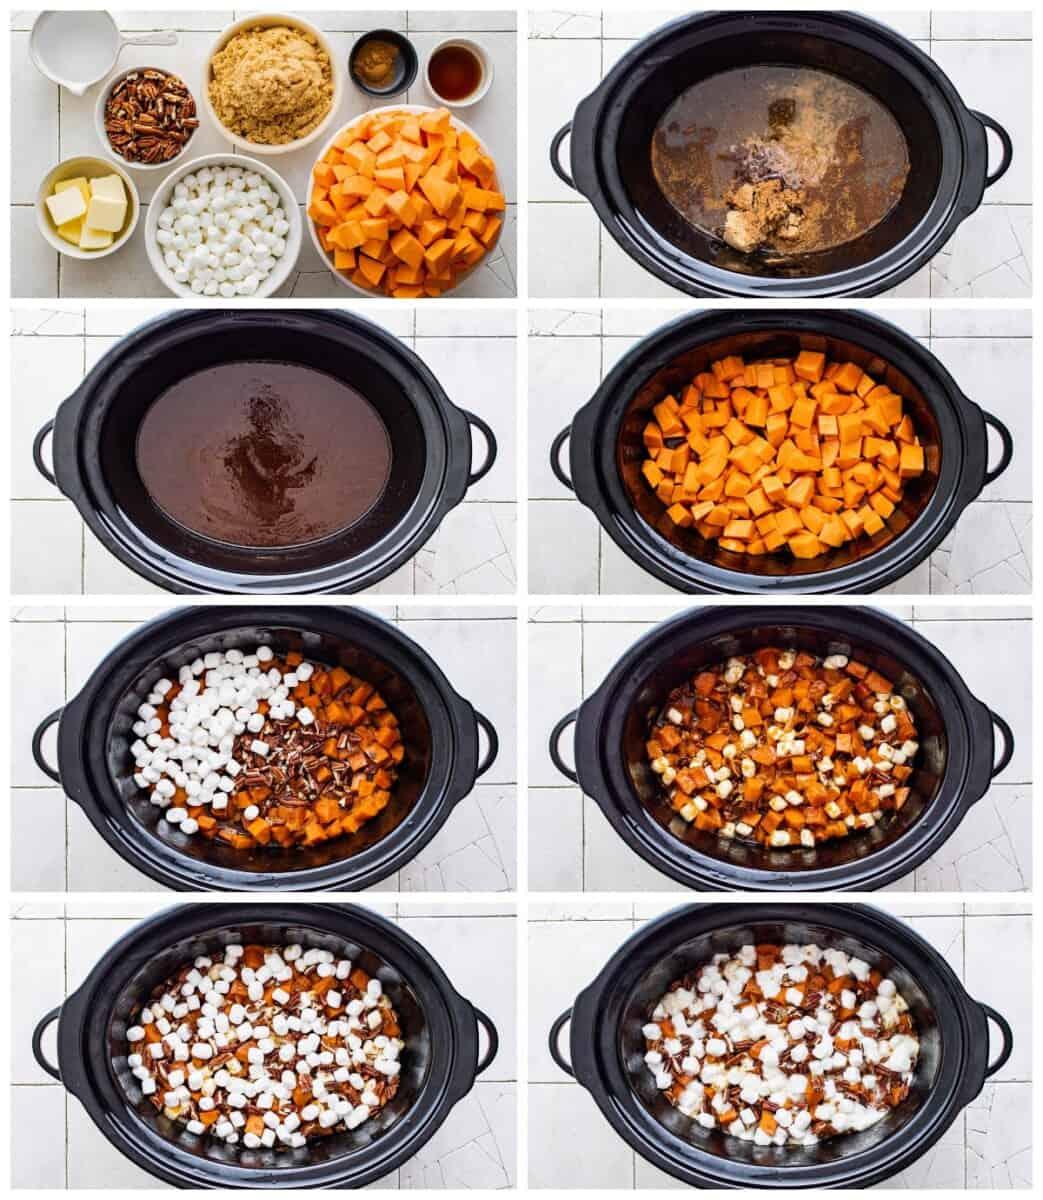 step by step photos for how to make crockpot sweet potato casserole